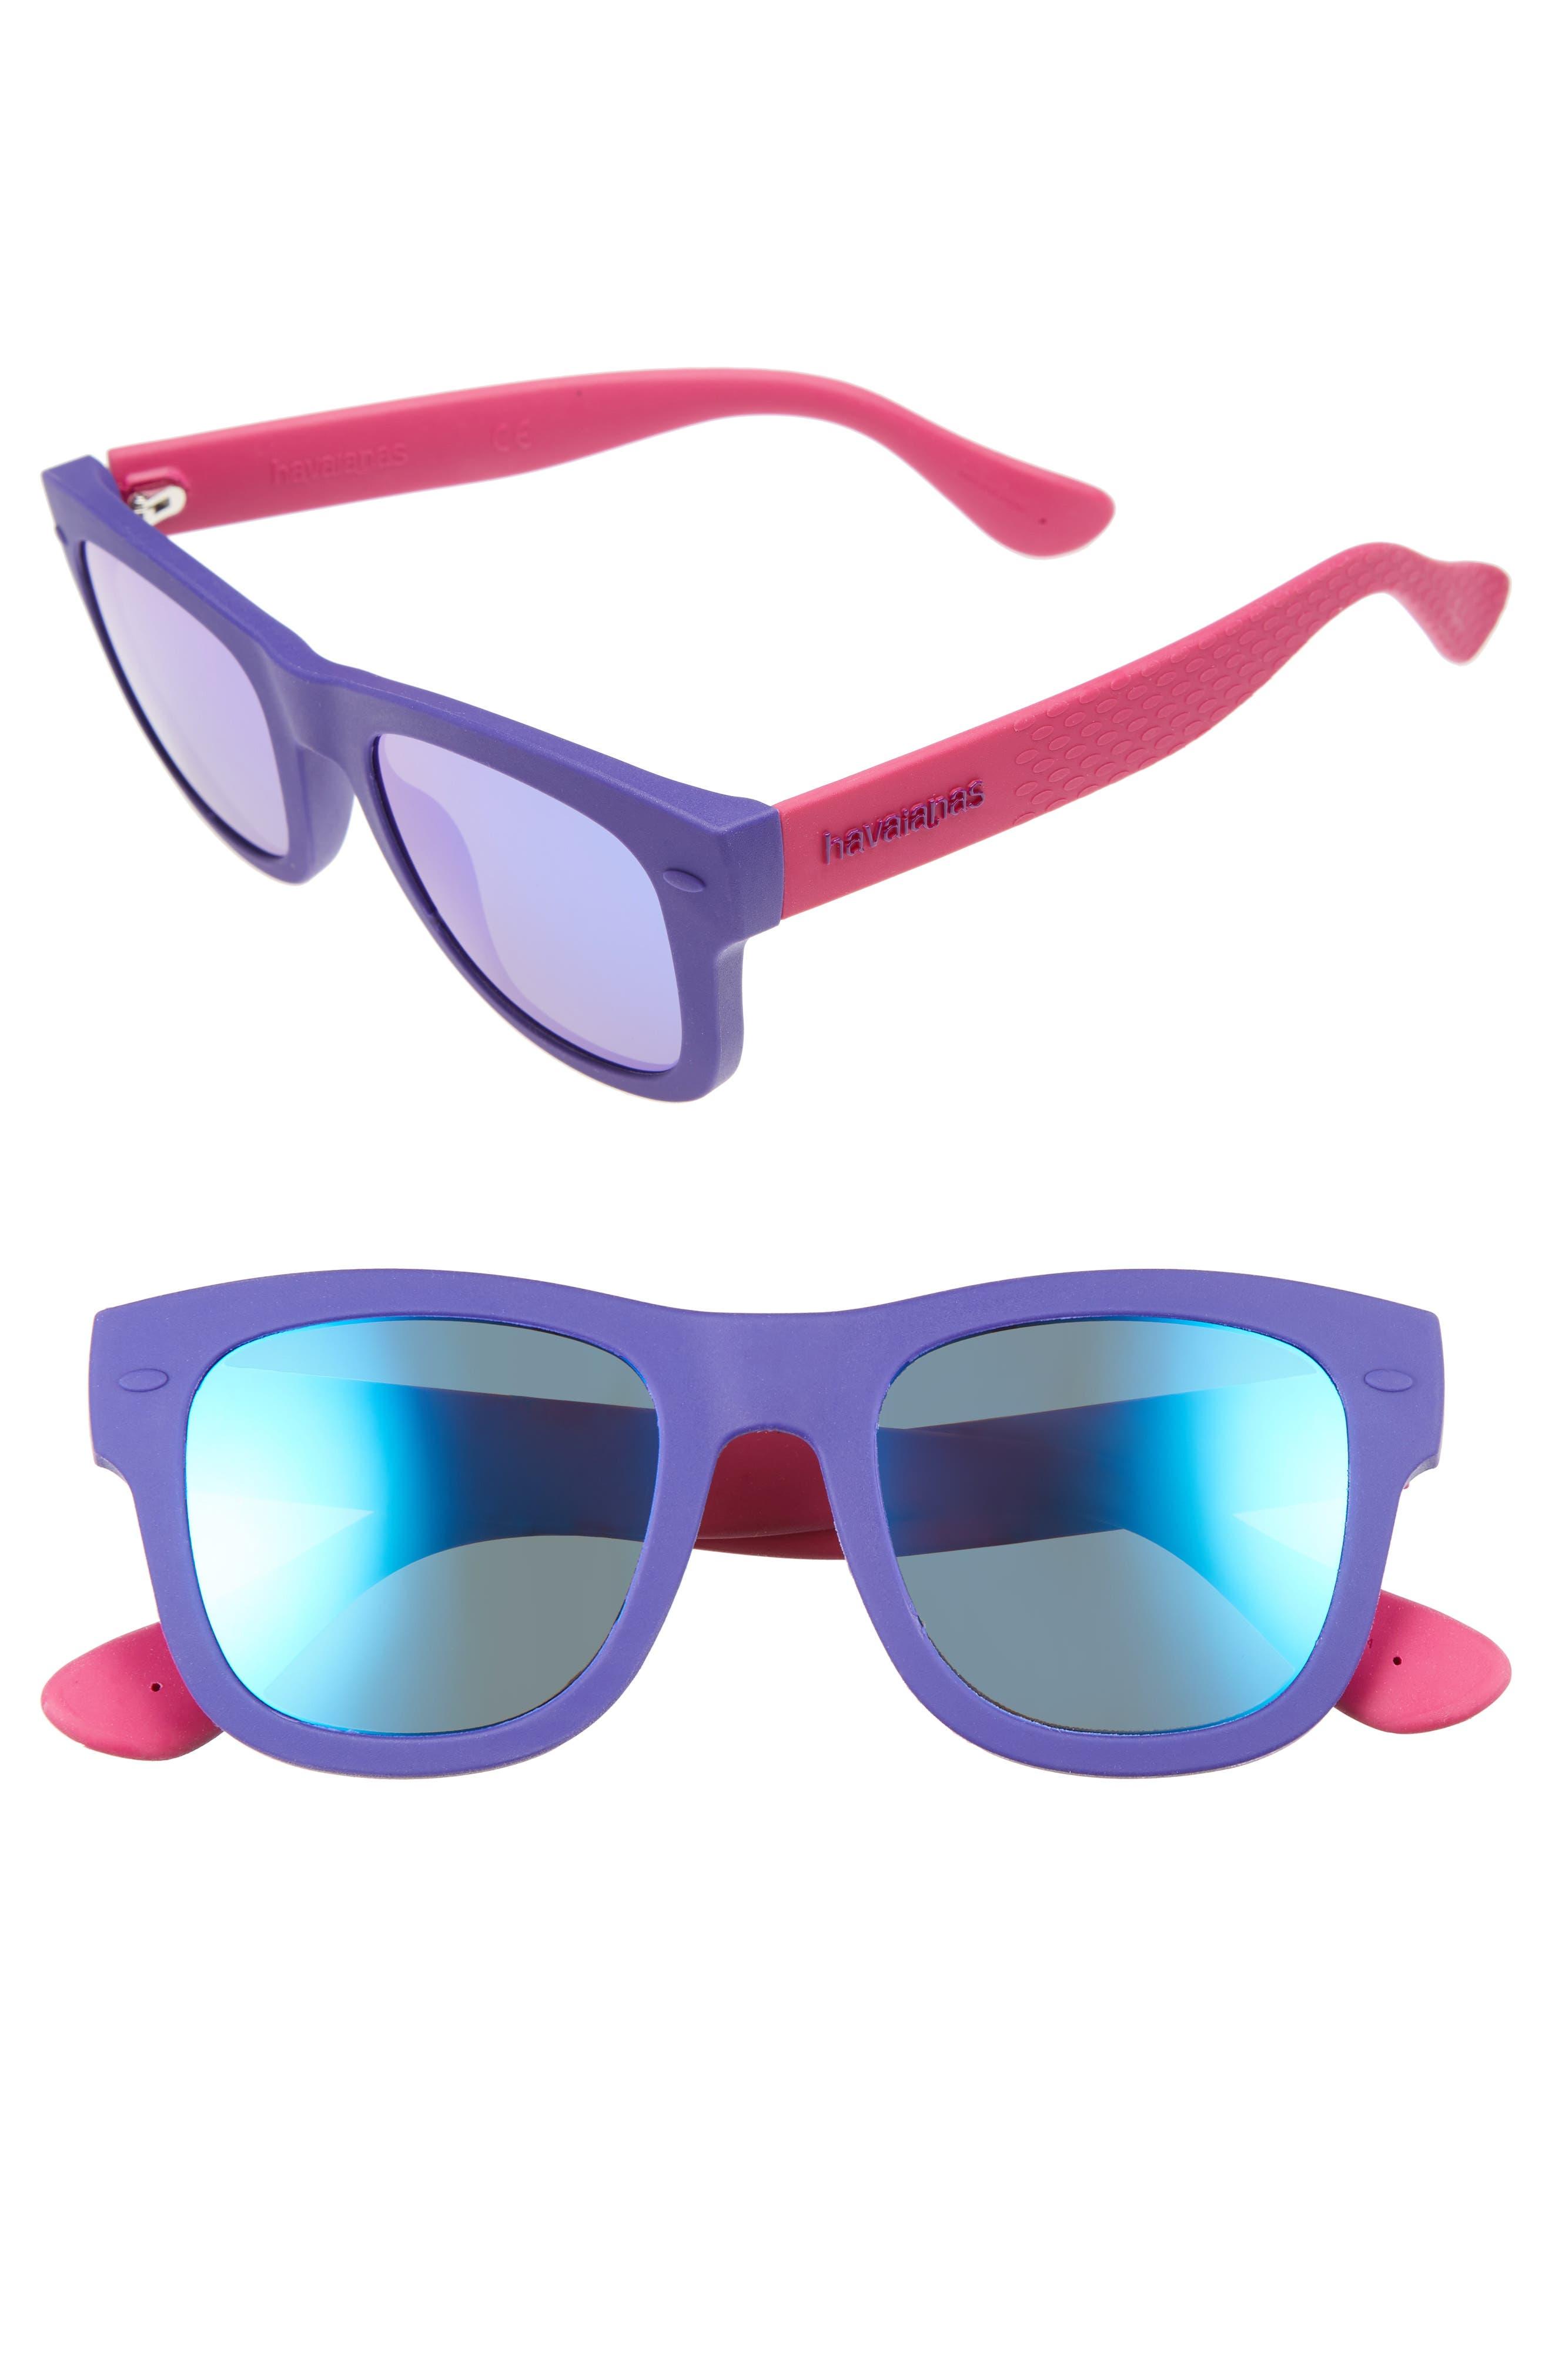 Havaianas Paraty 50mm Retro Sunglasses